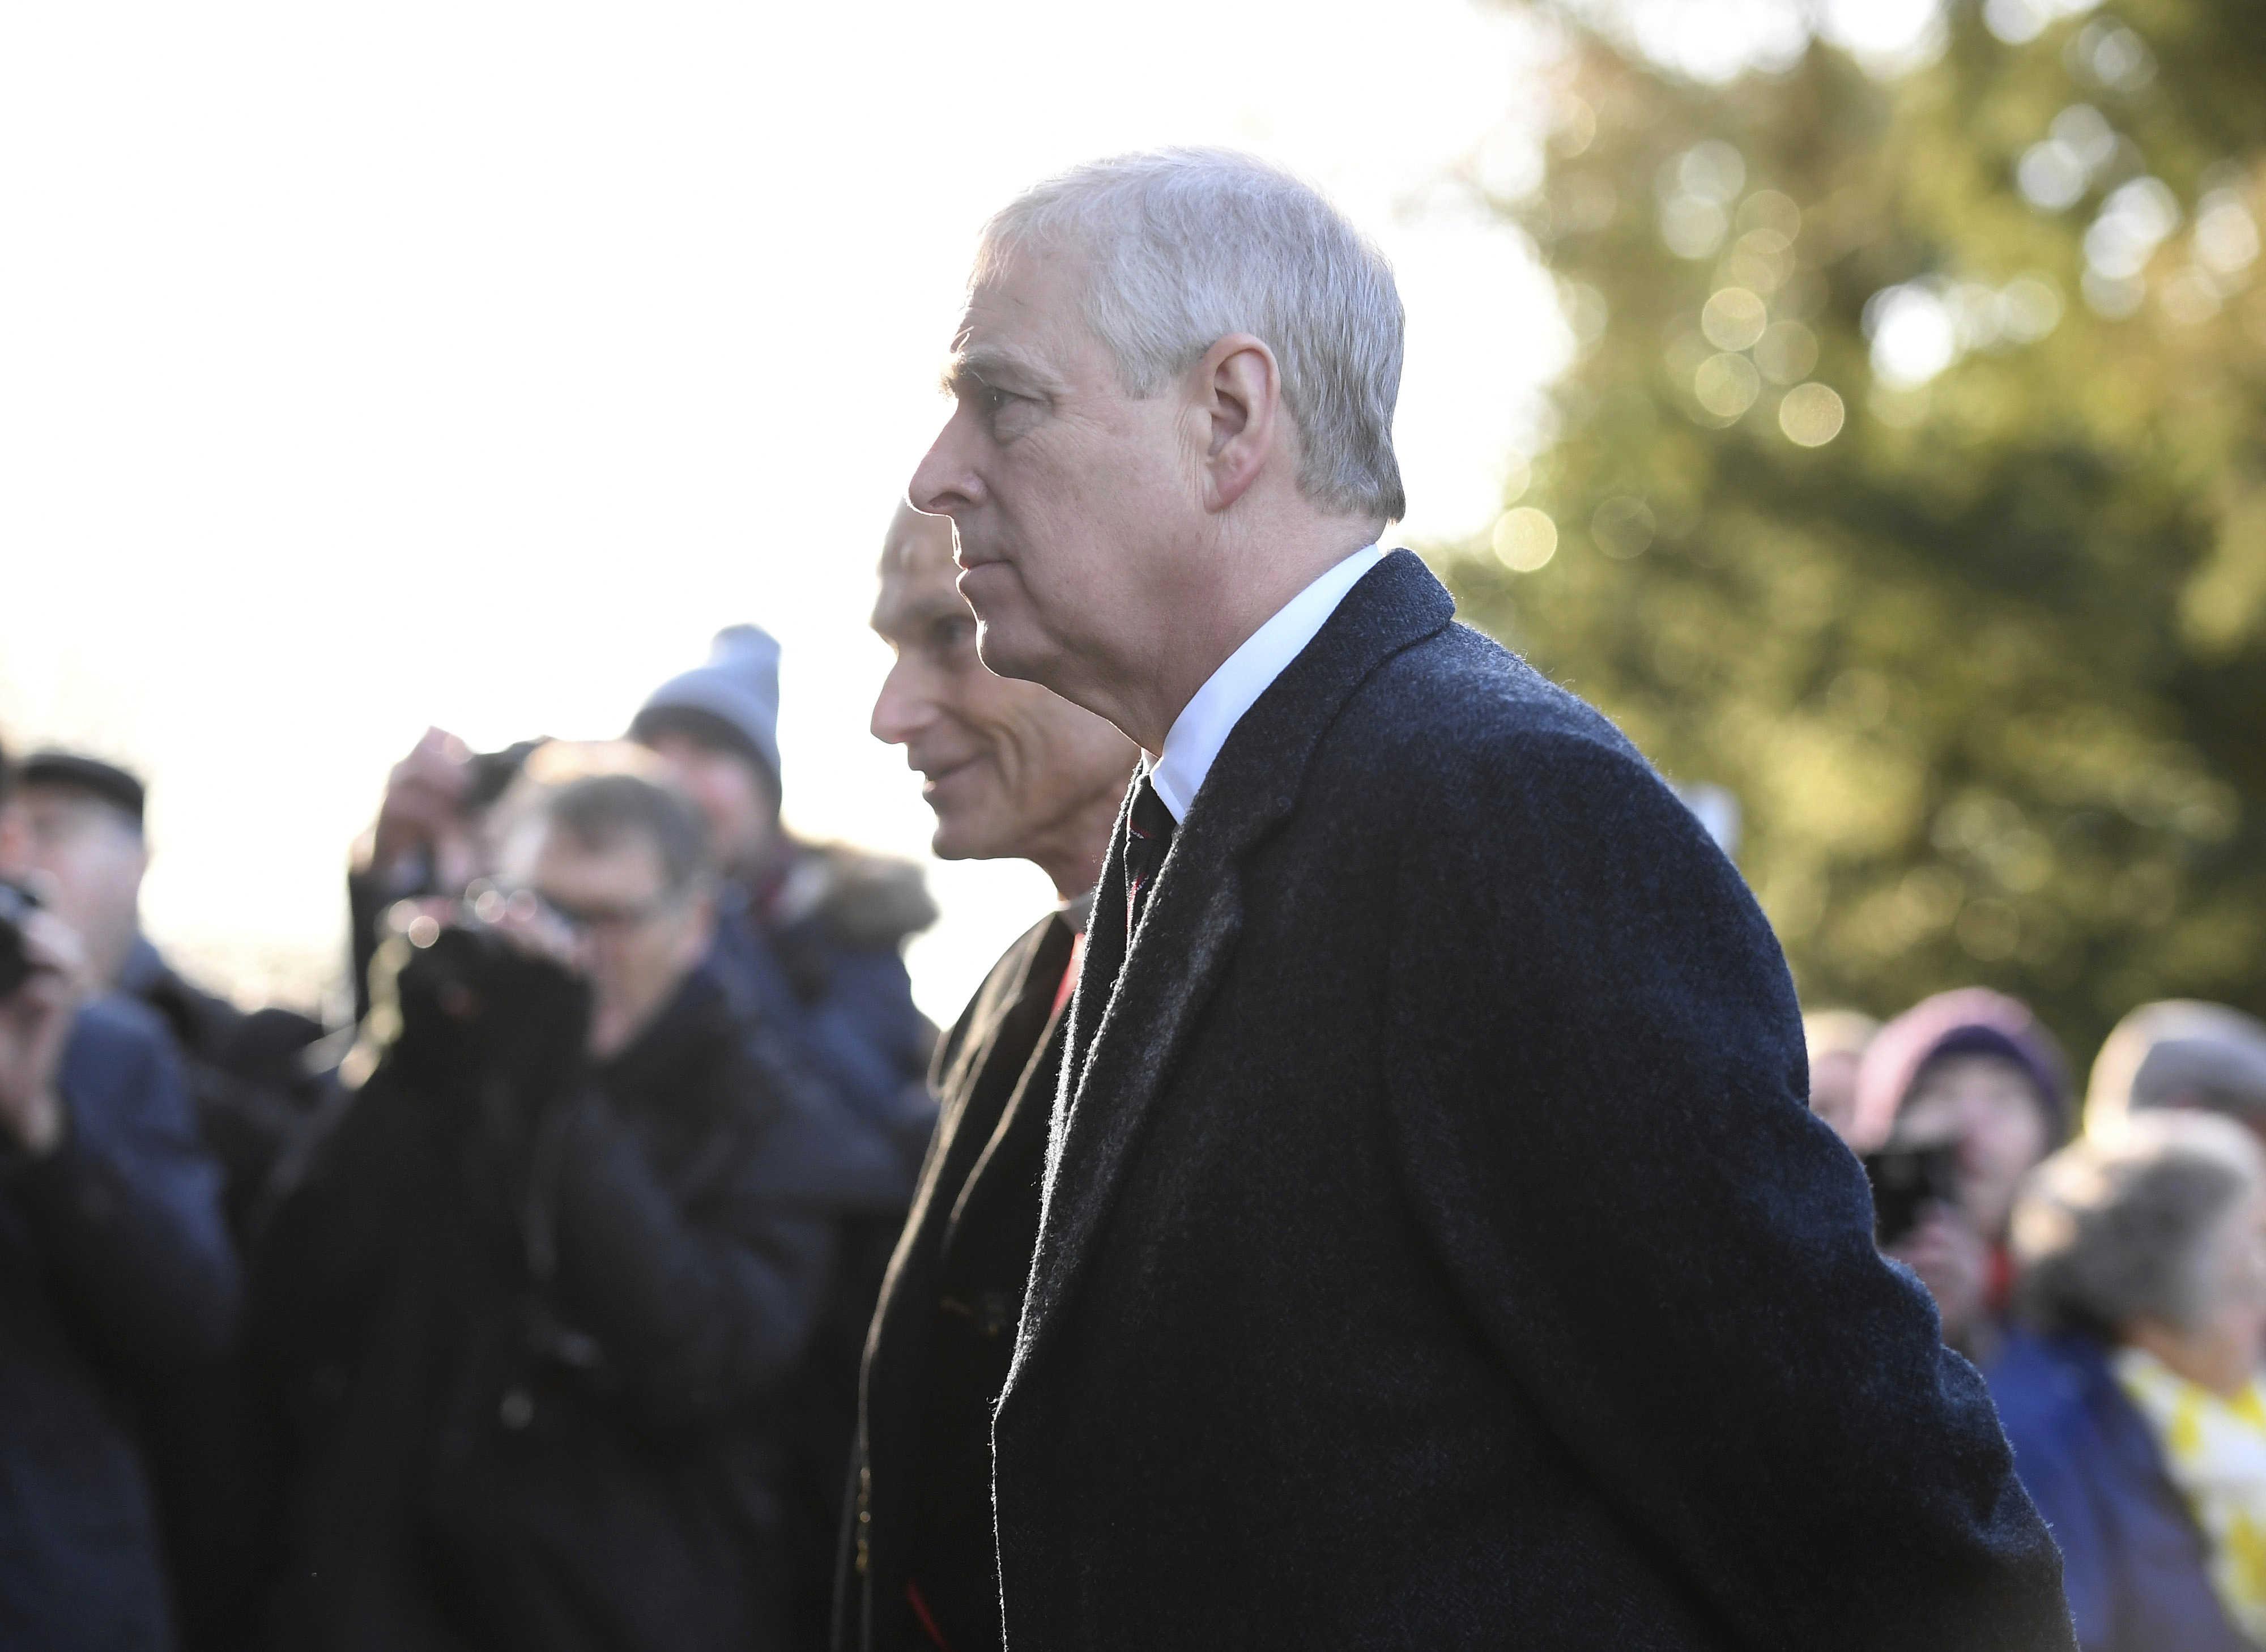 New Pressure On Prince Andrew To Help Jeffrey Epstein Investigation